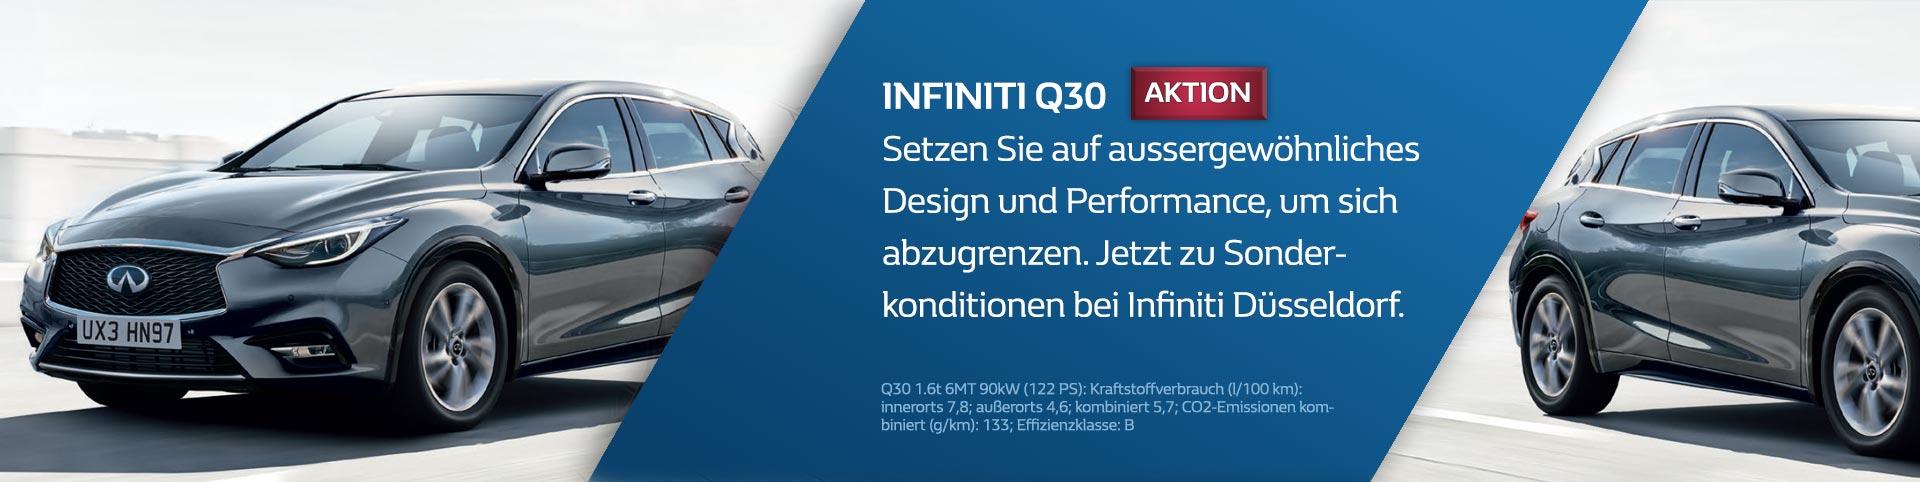 Infiniti Q30 Sonderangebot in Düsseldorf